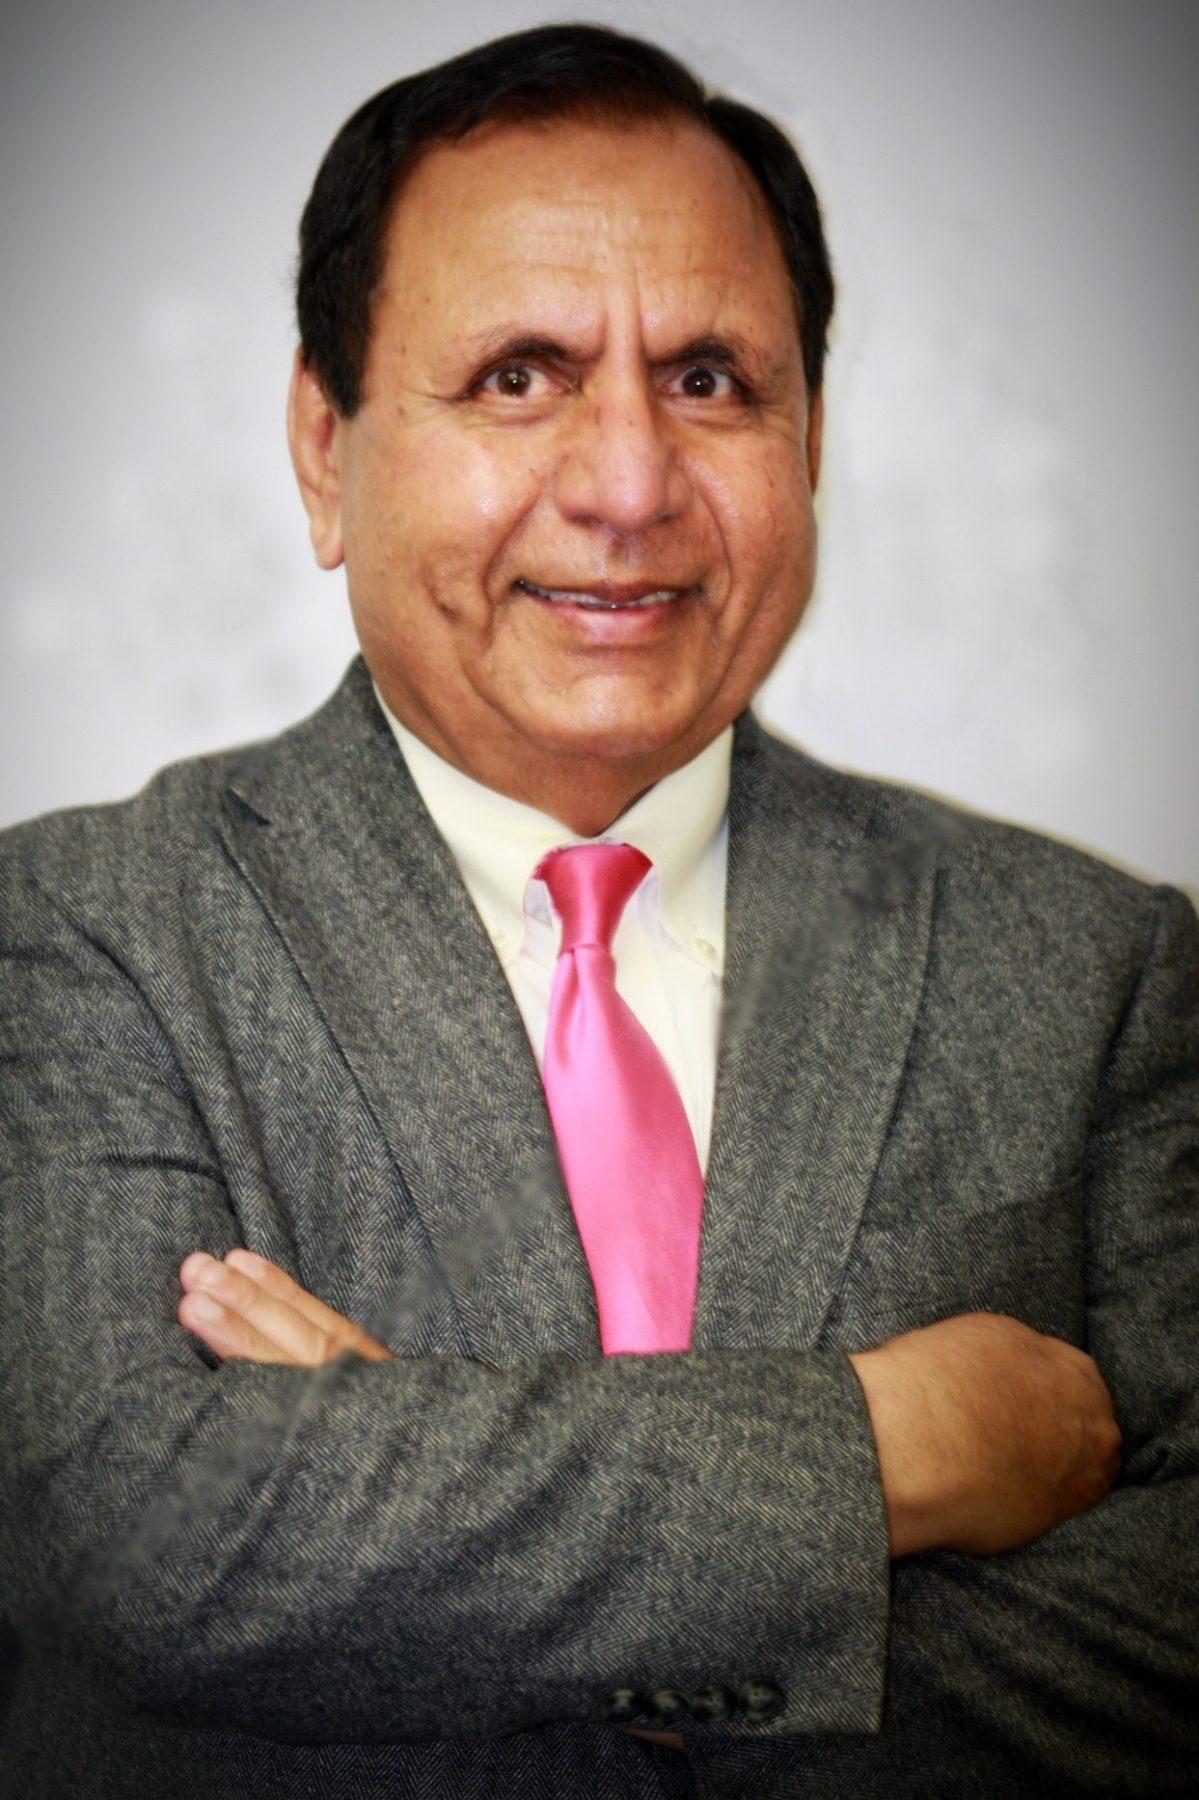 Dr. Shah Crenshaw Community Psychiatrist